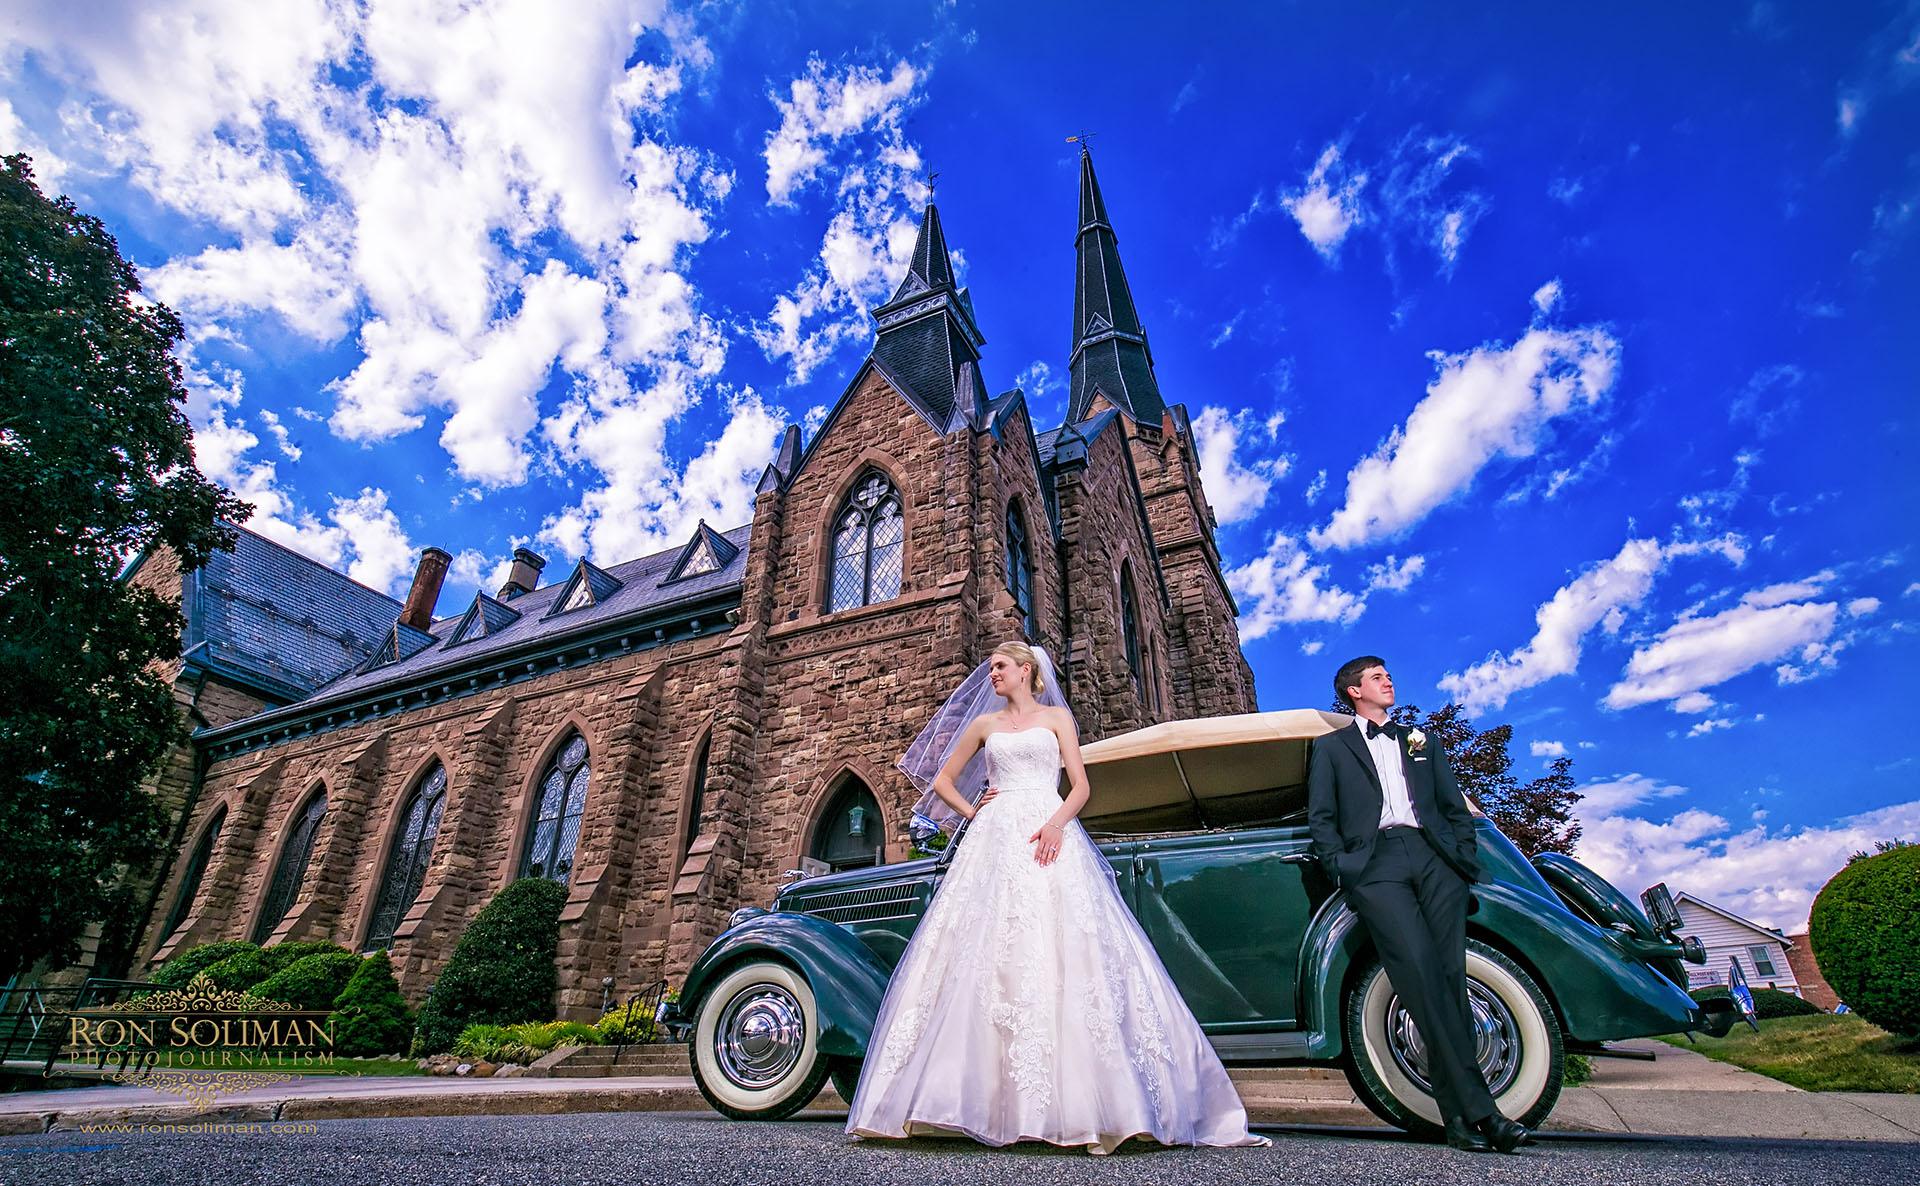 Best Vintage wedding car photos